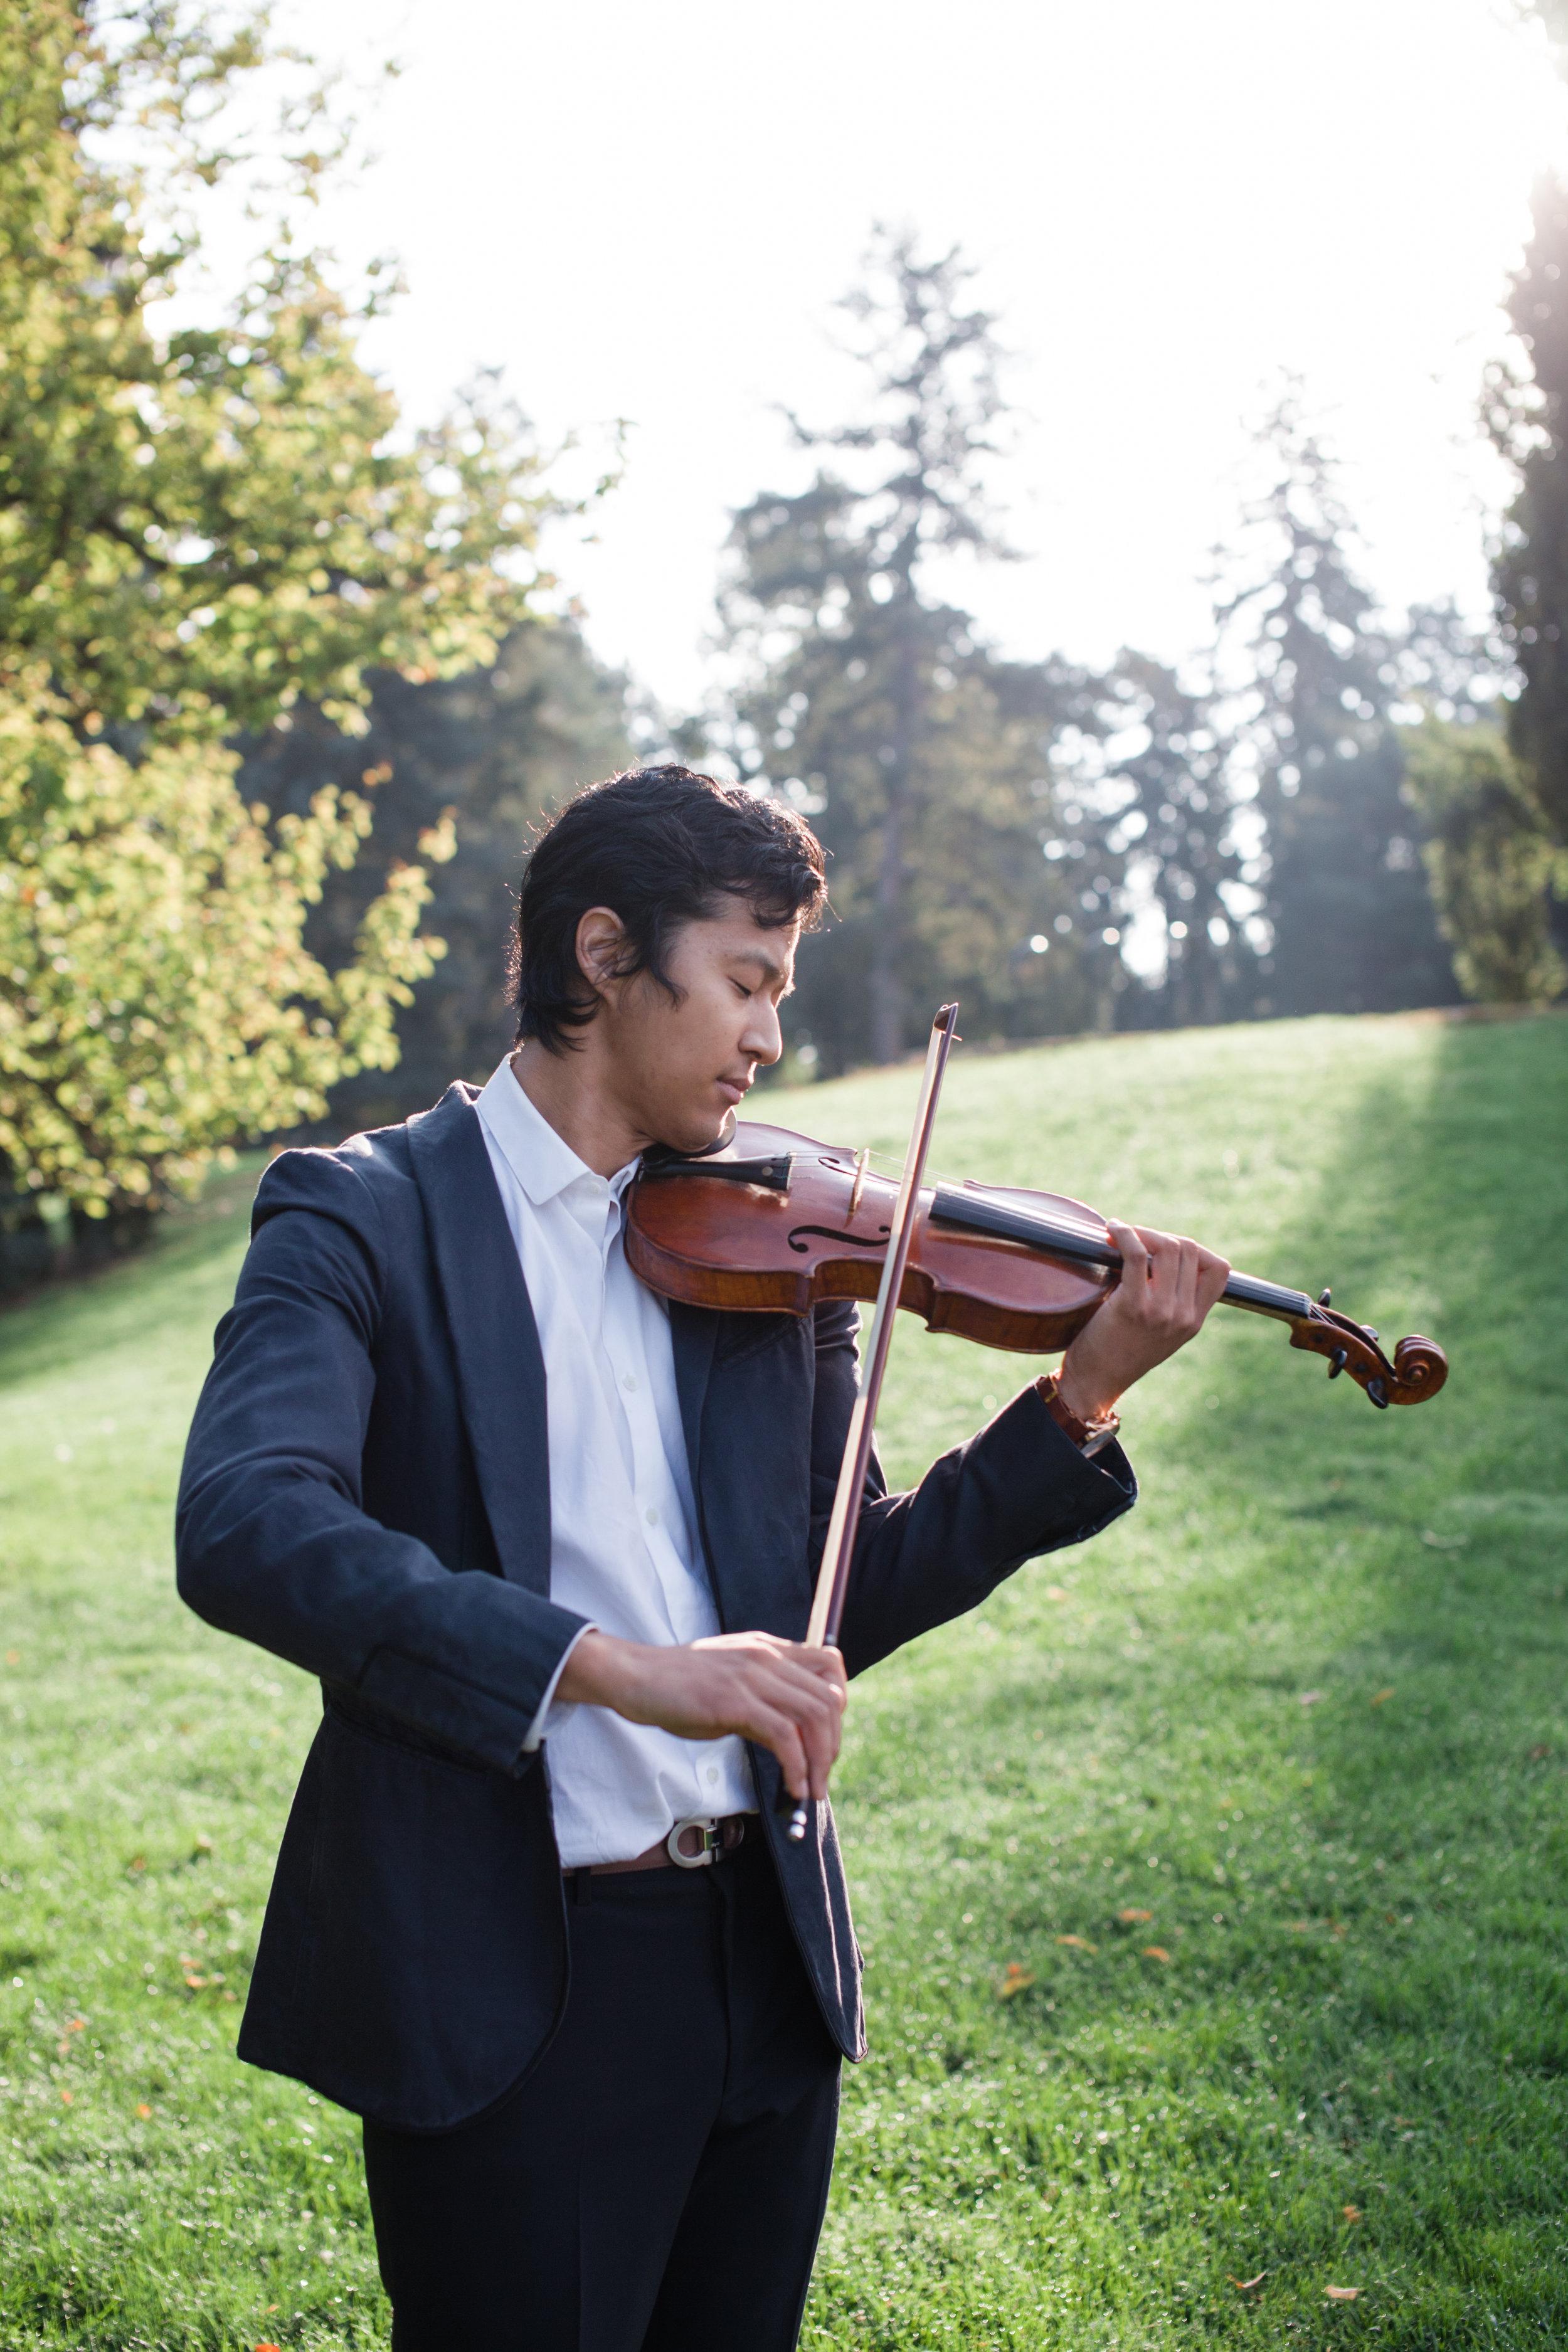 violin player photos.jpg